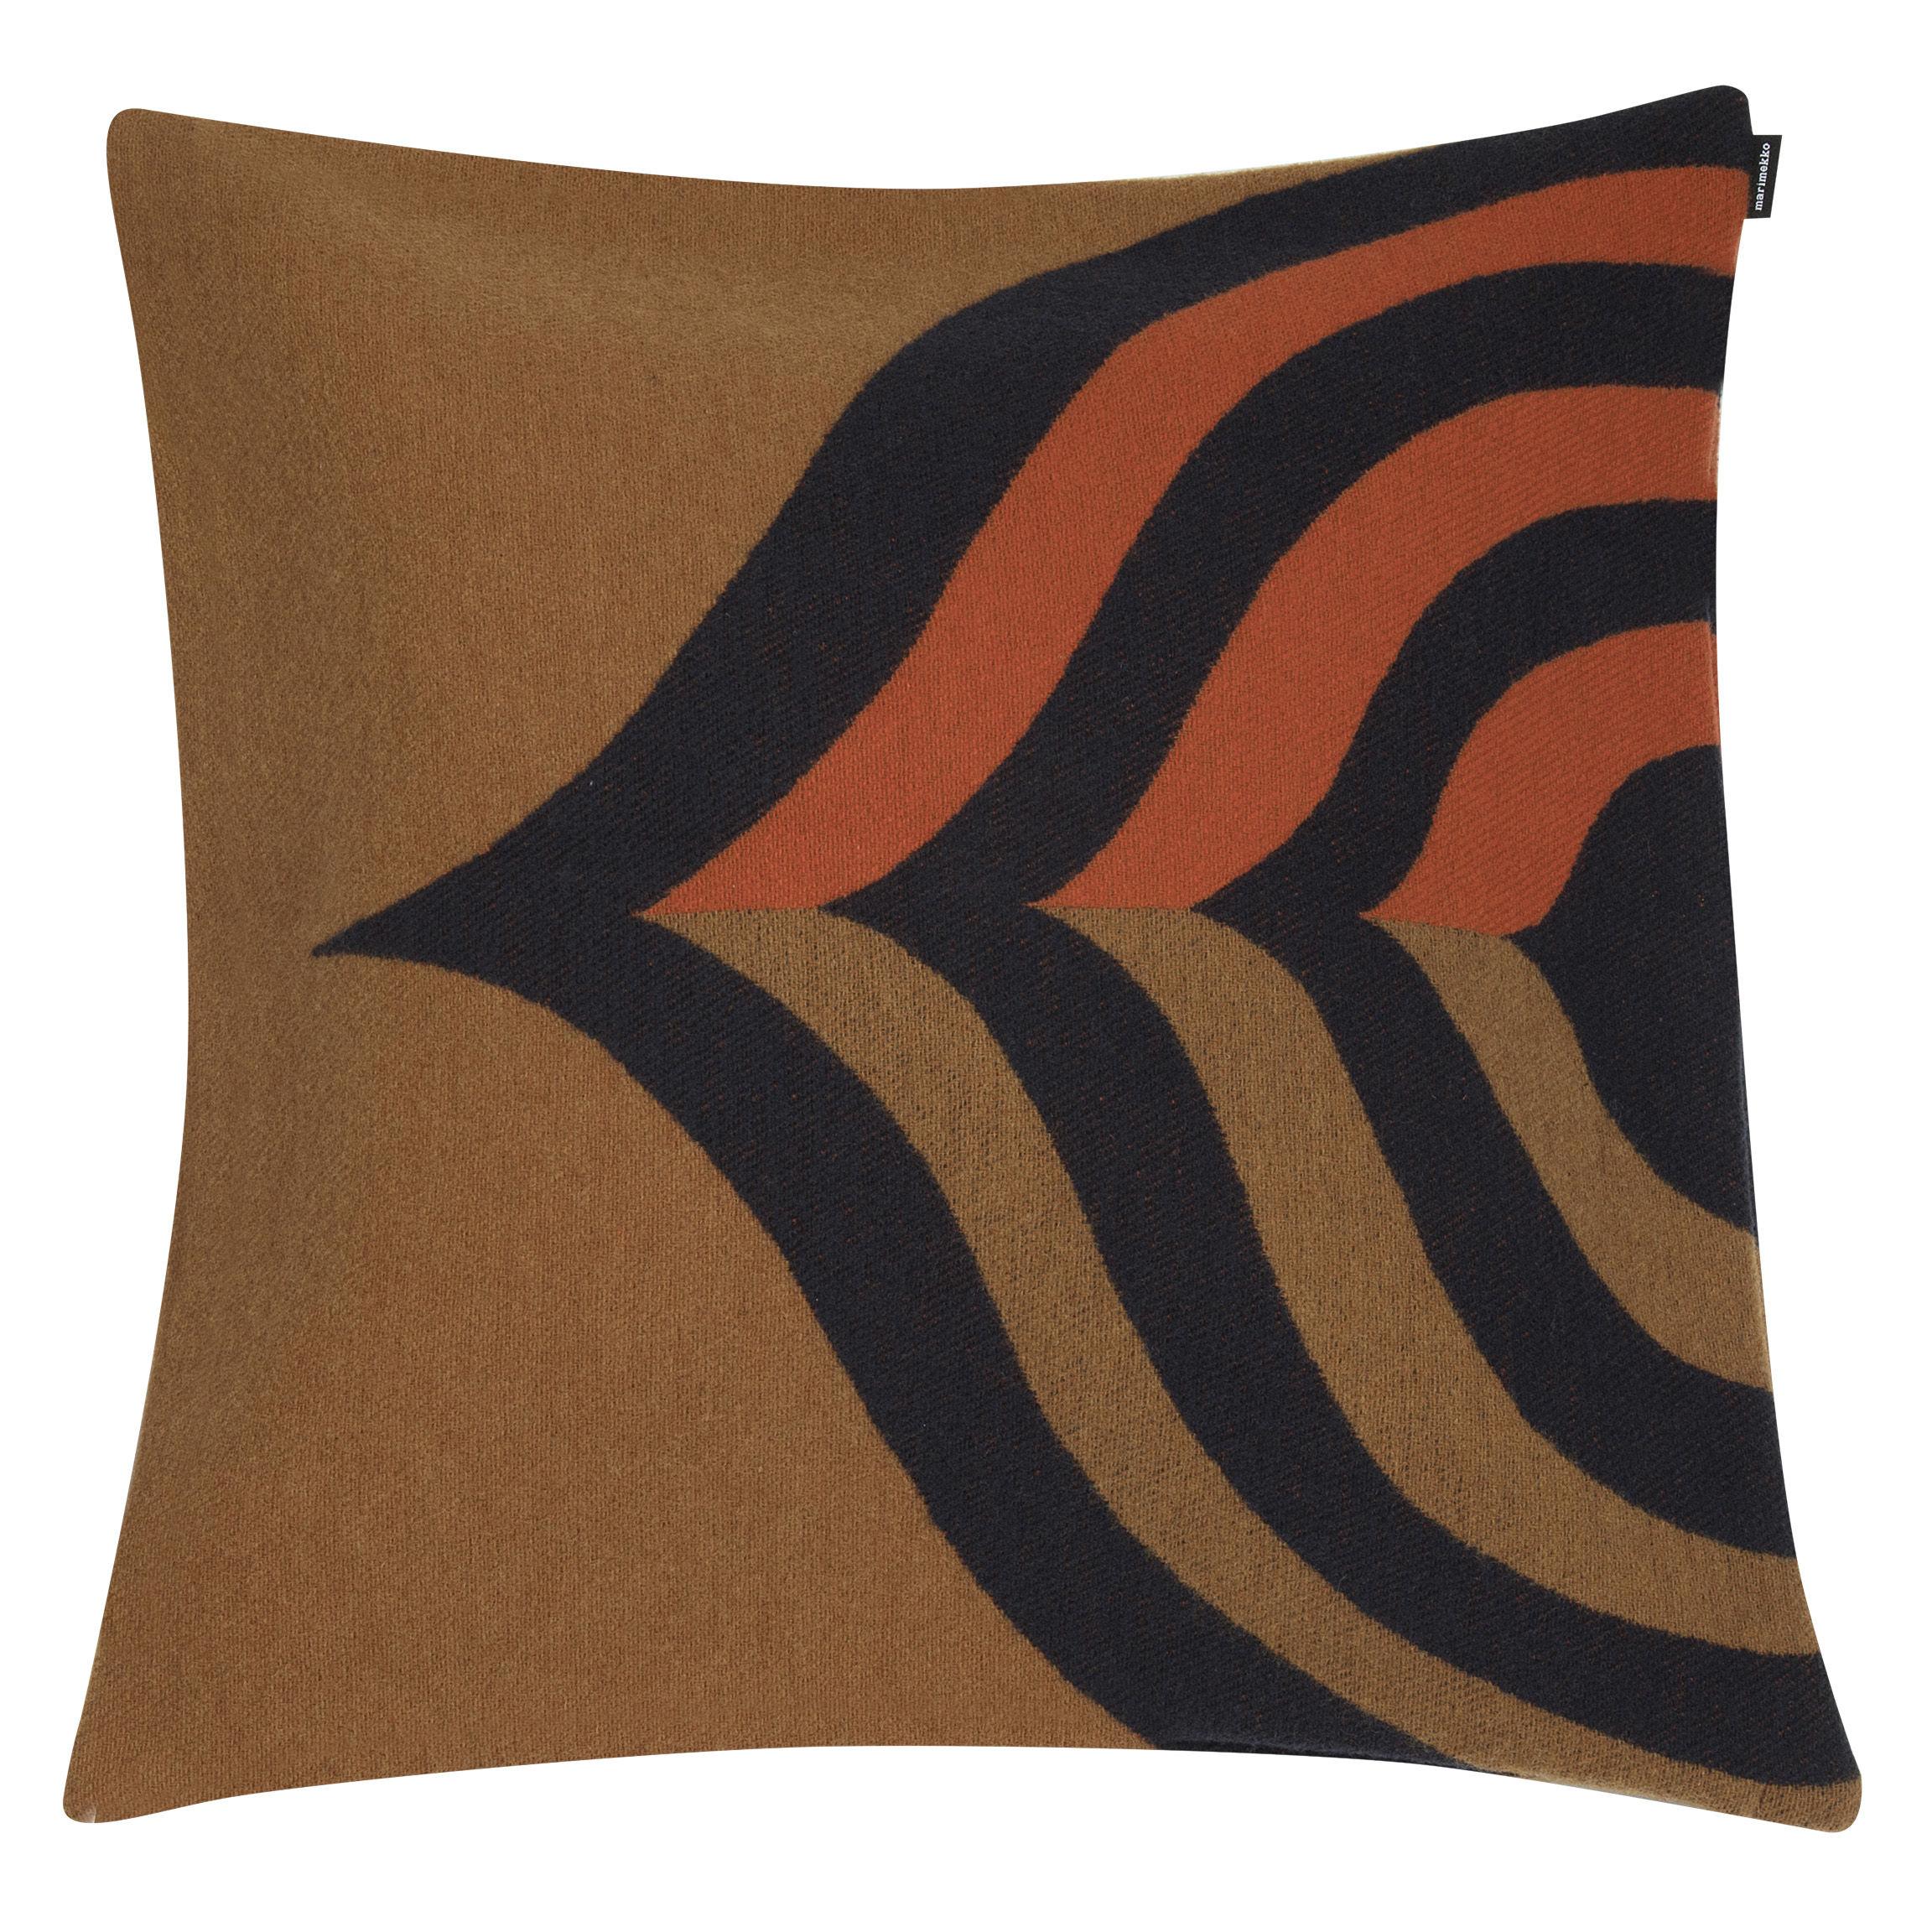 Decoration - Cushions & Poufs - Keisarinkruunu Cushion cover - / 50 x 50cm by Marimekko - Keisarinkruunu / Brown & orange - Cotton, Polyamide, Wool